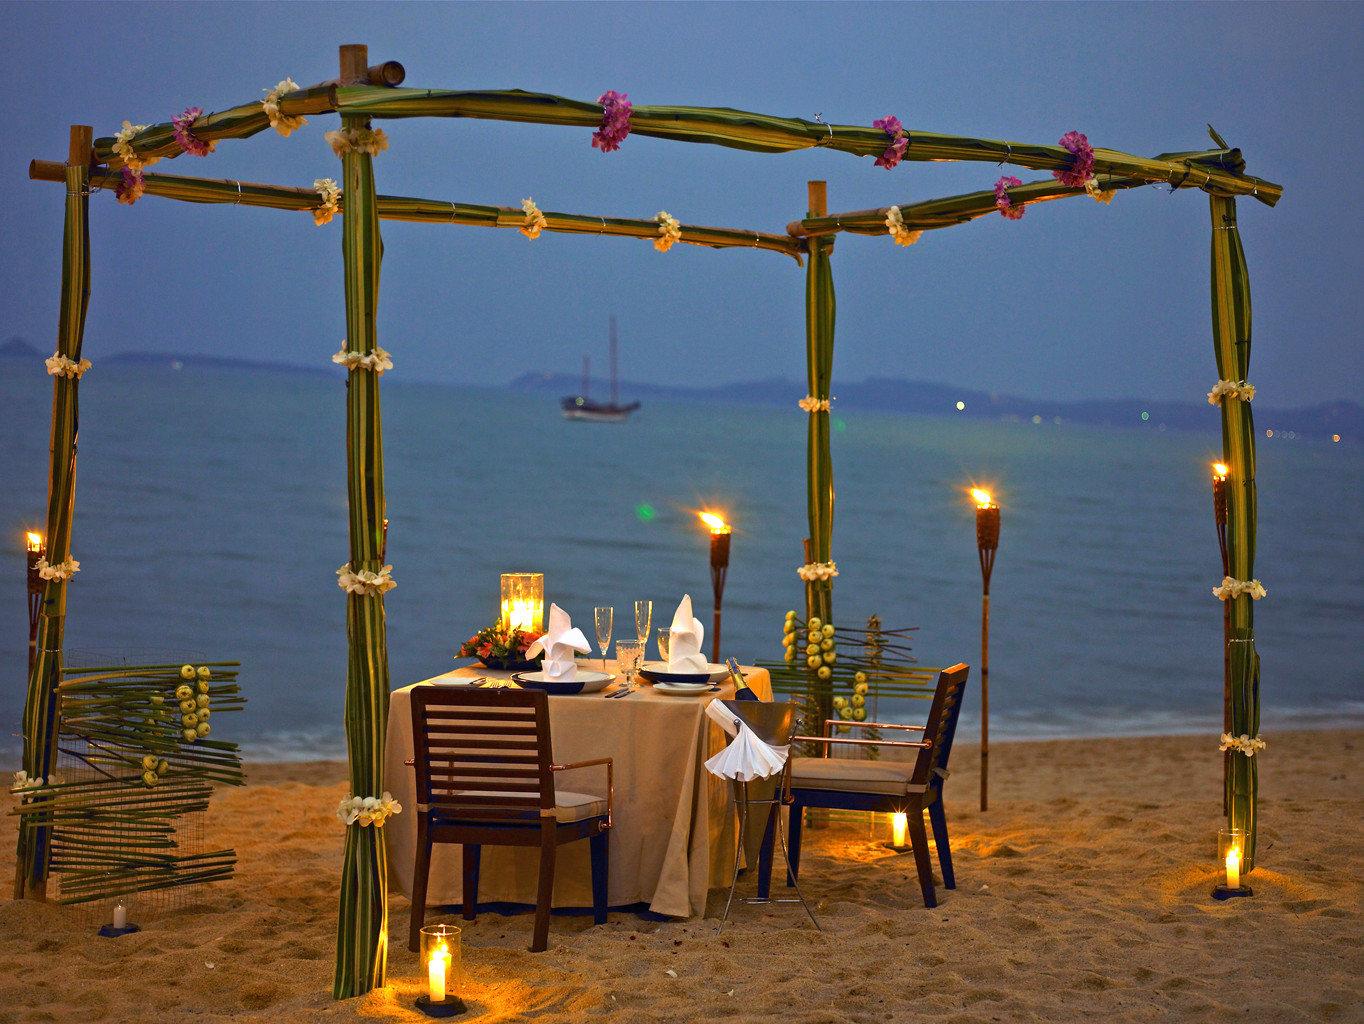 Beach Beachfront Dining Drink Eat Luxury Romantic sky yellow evening lighting vehicle day